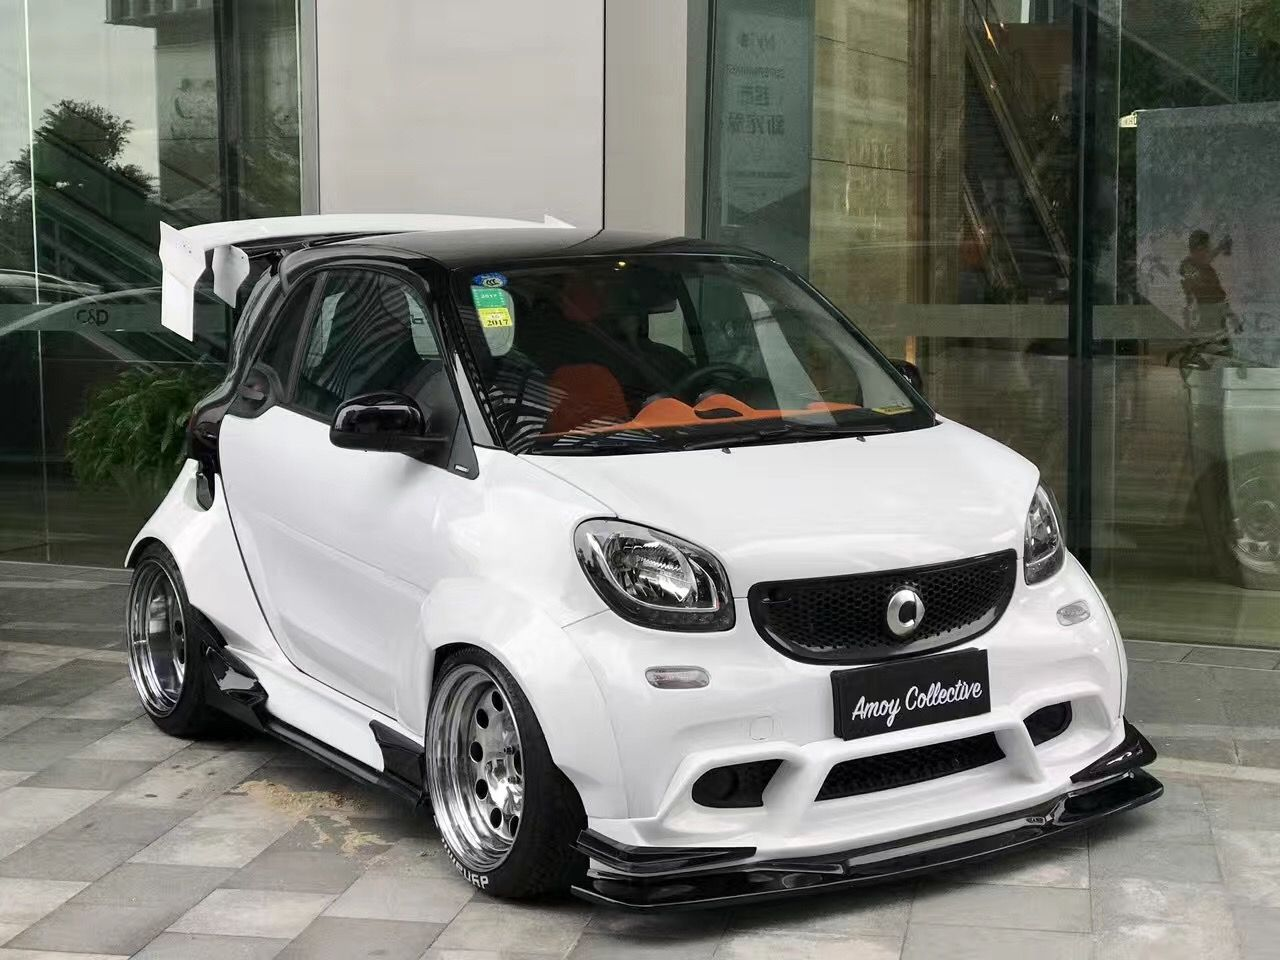 Smart 453 wide body Smart fortwo, Benz smart, Smart car